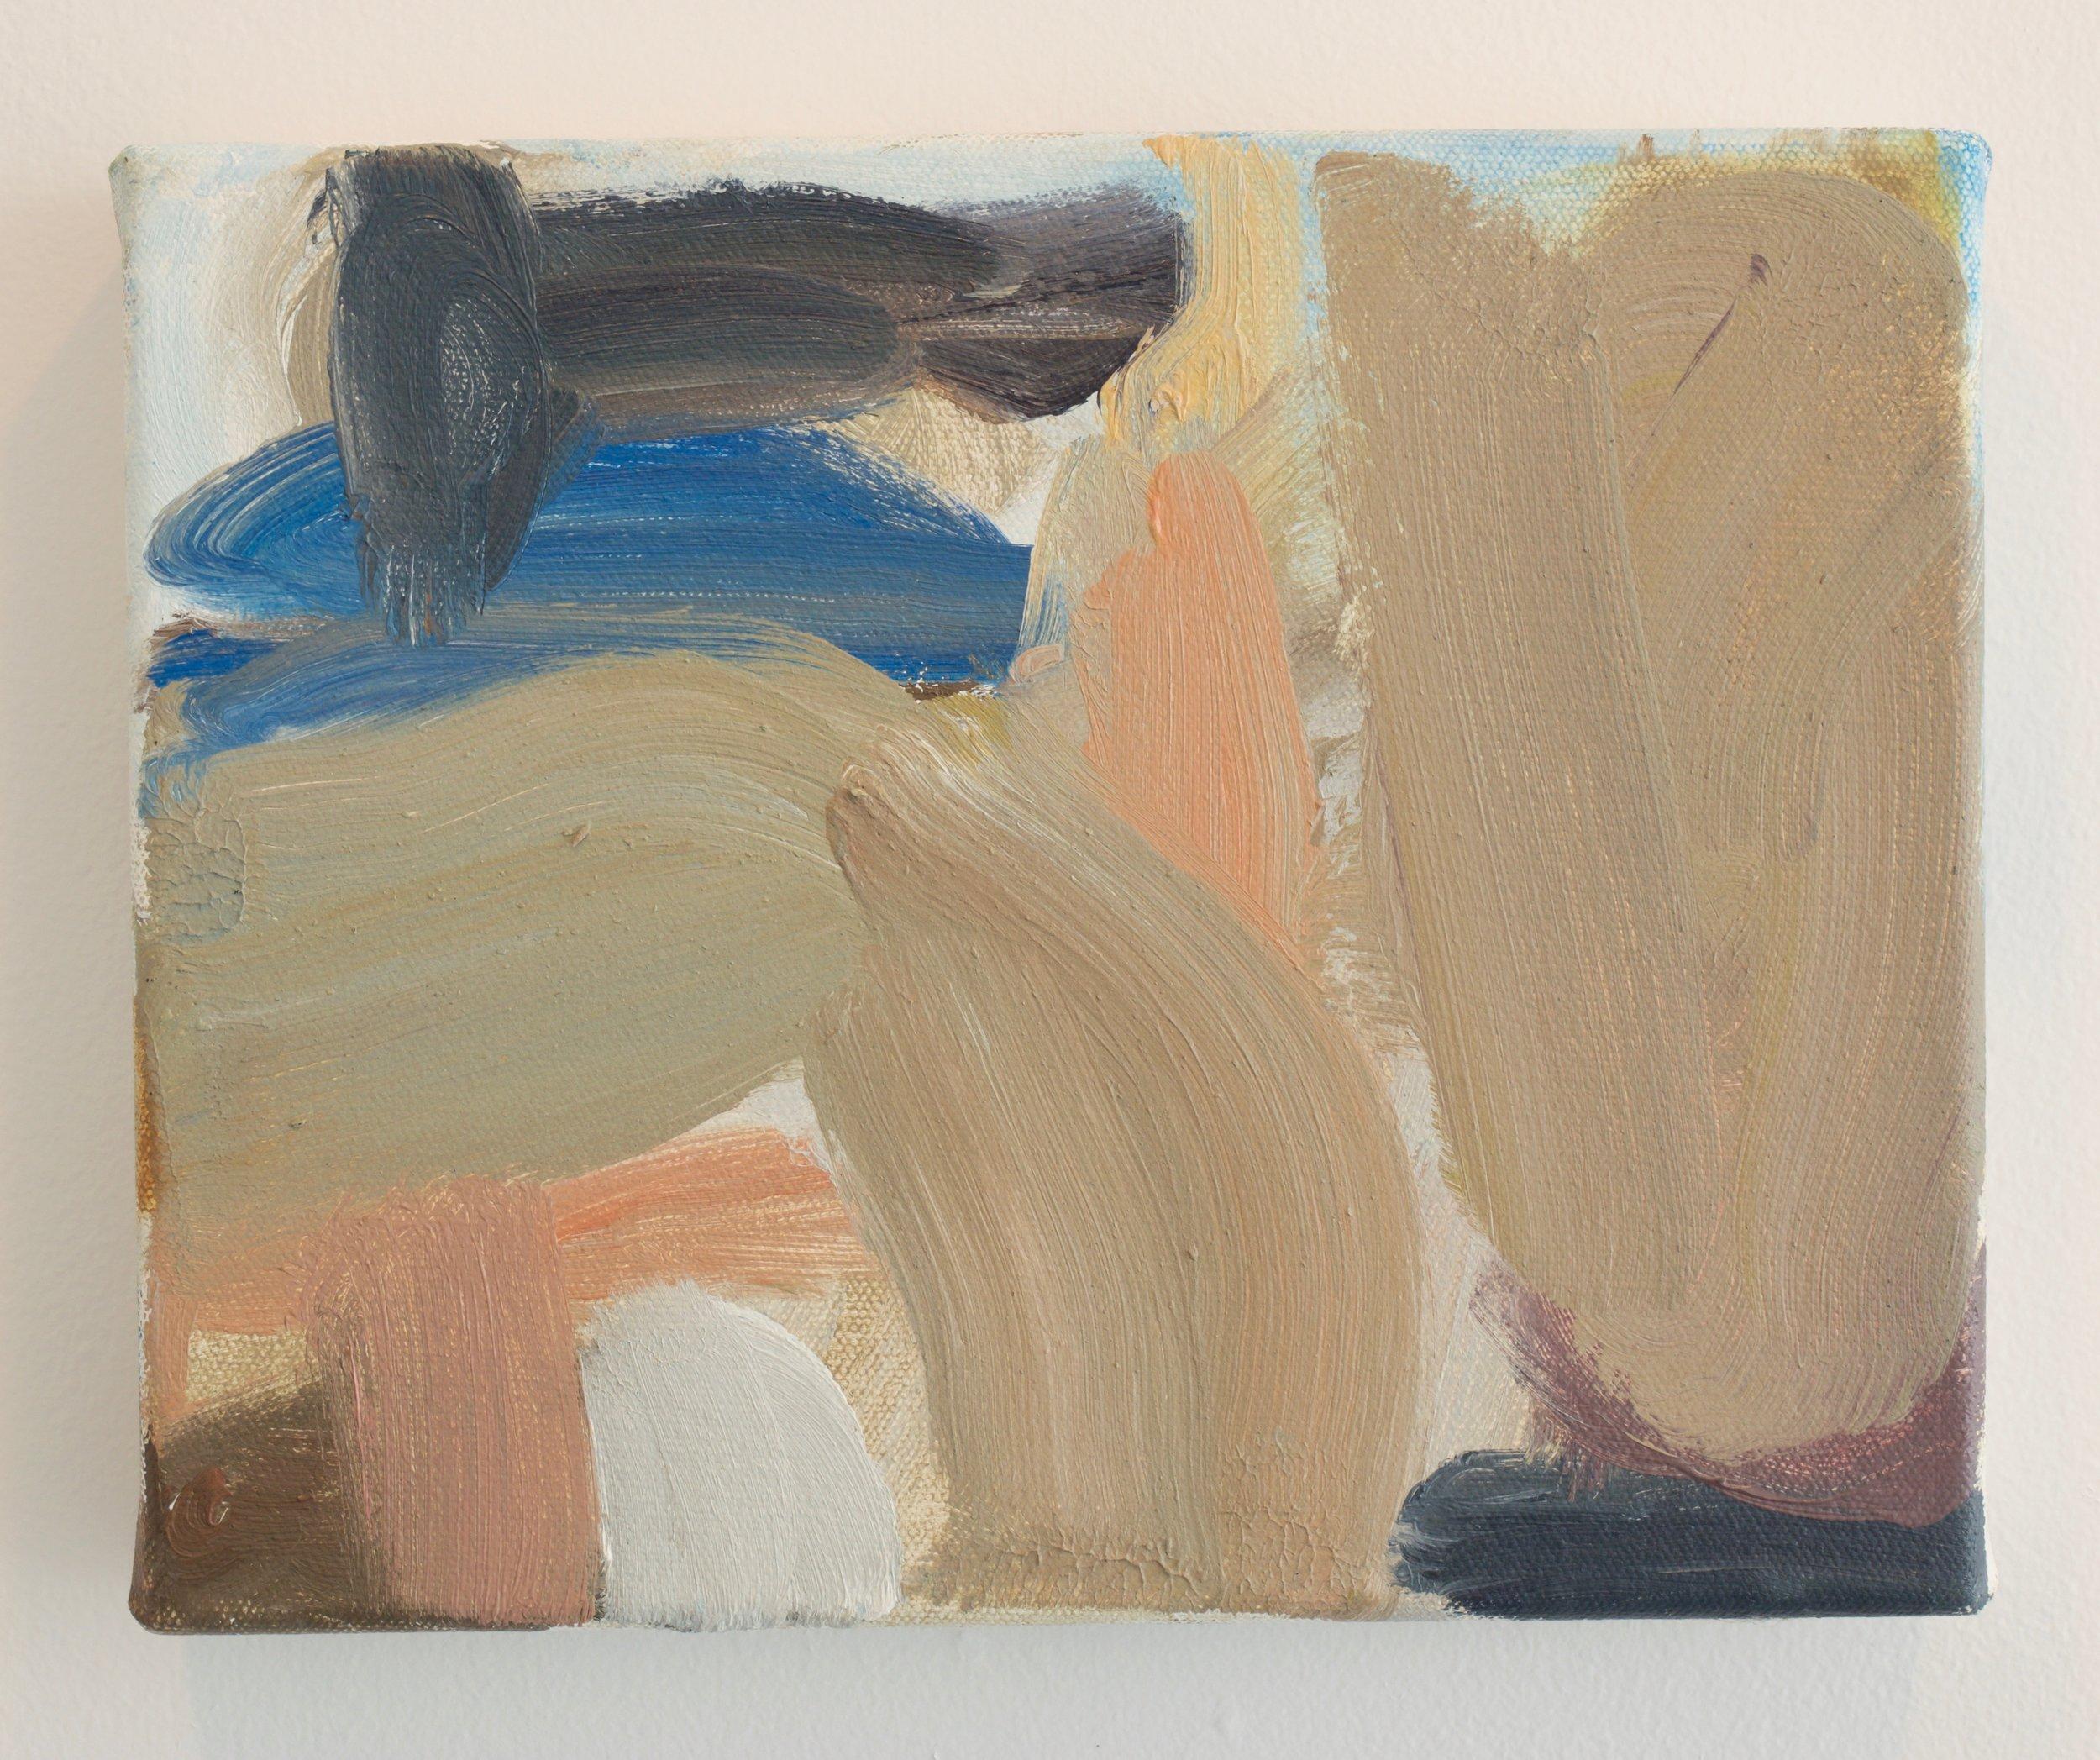 Virva Hinnemo, Ground Work, 2017. Oil on Canvas, 8 x 10 inches.